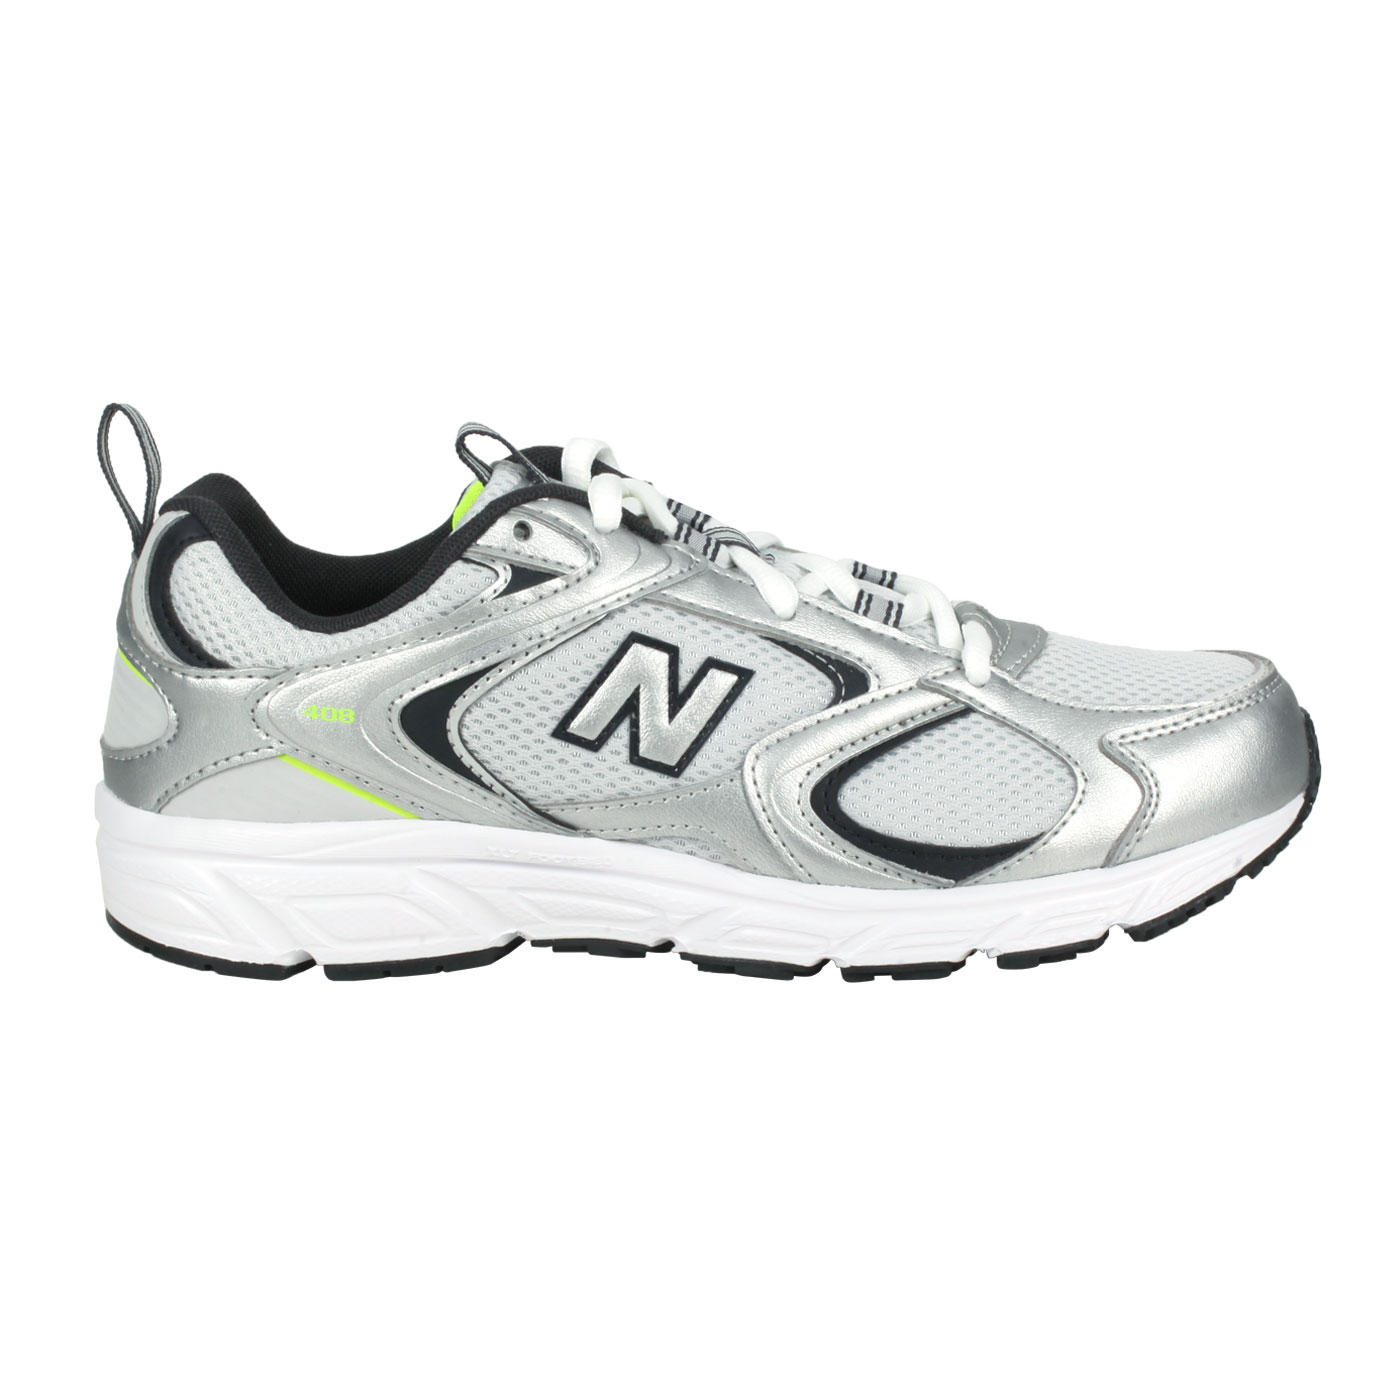 NEW BALANCE 女款復古運動鞋 ML408C - 銀黑綠